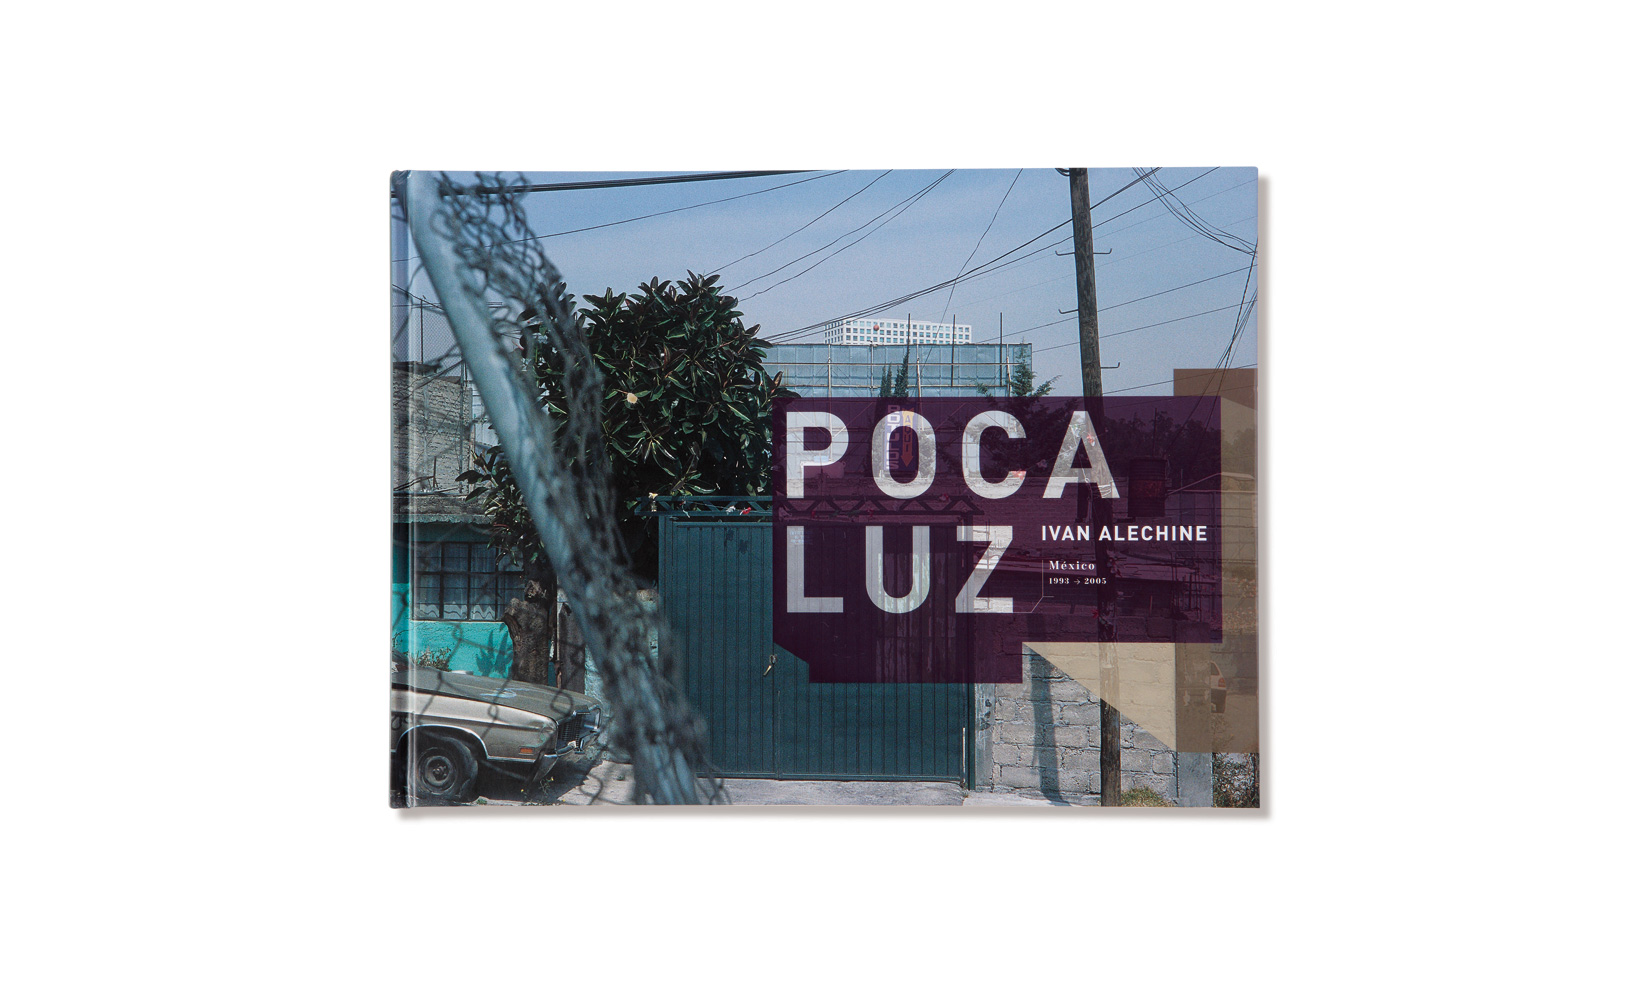 Poca-Luz-1000.jpg